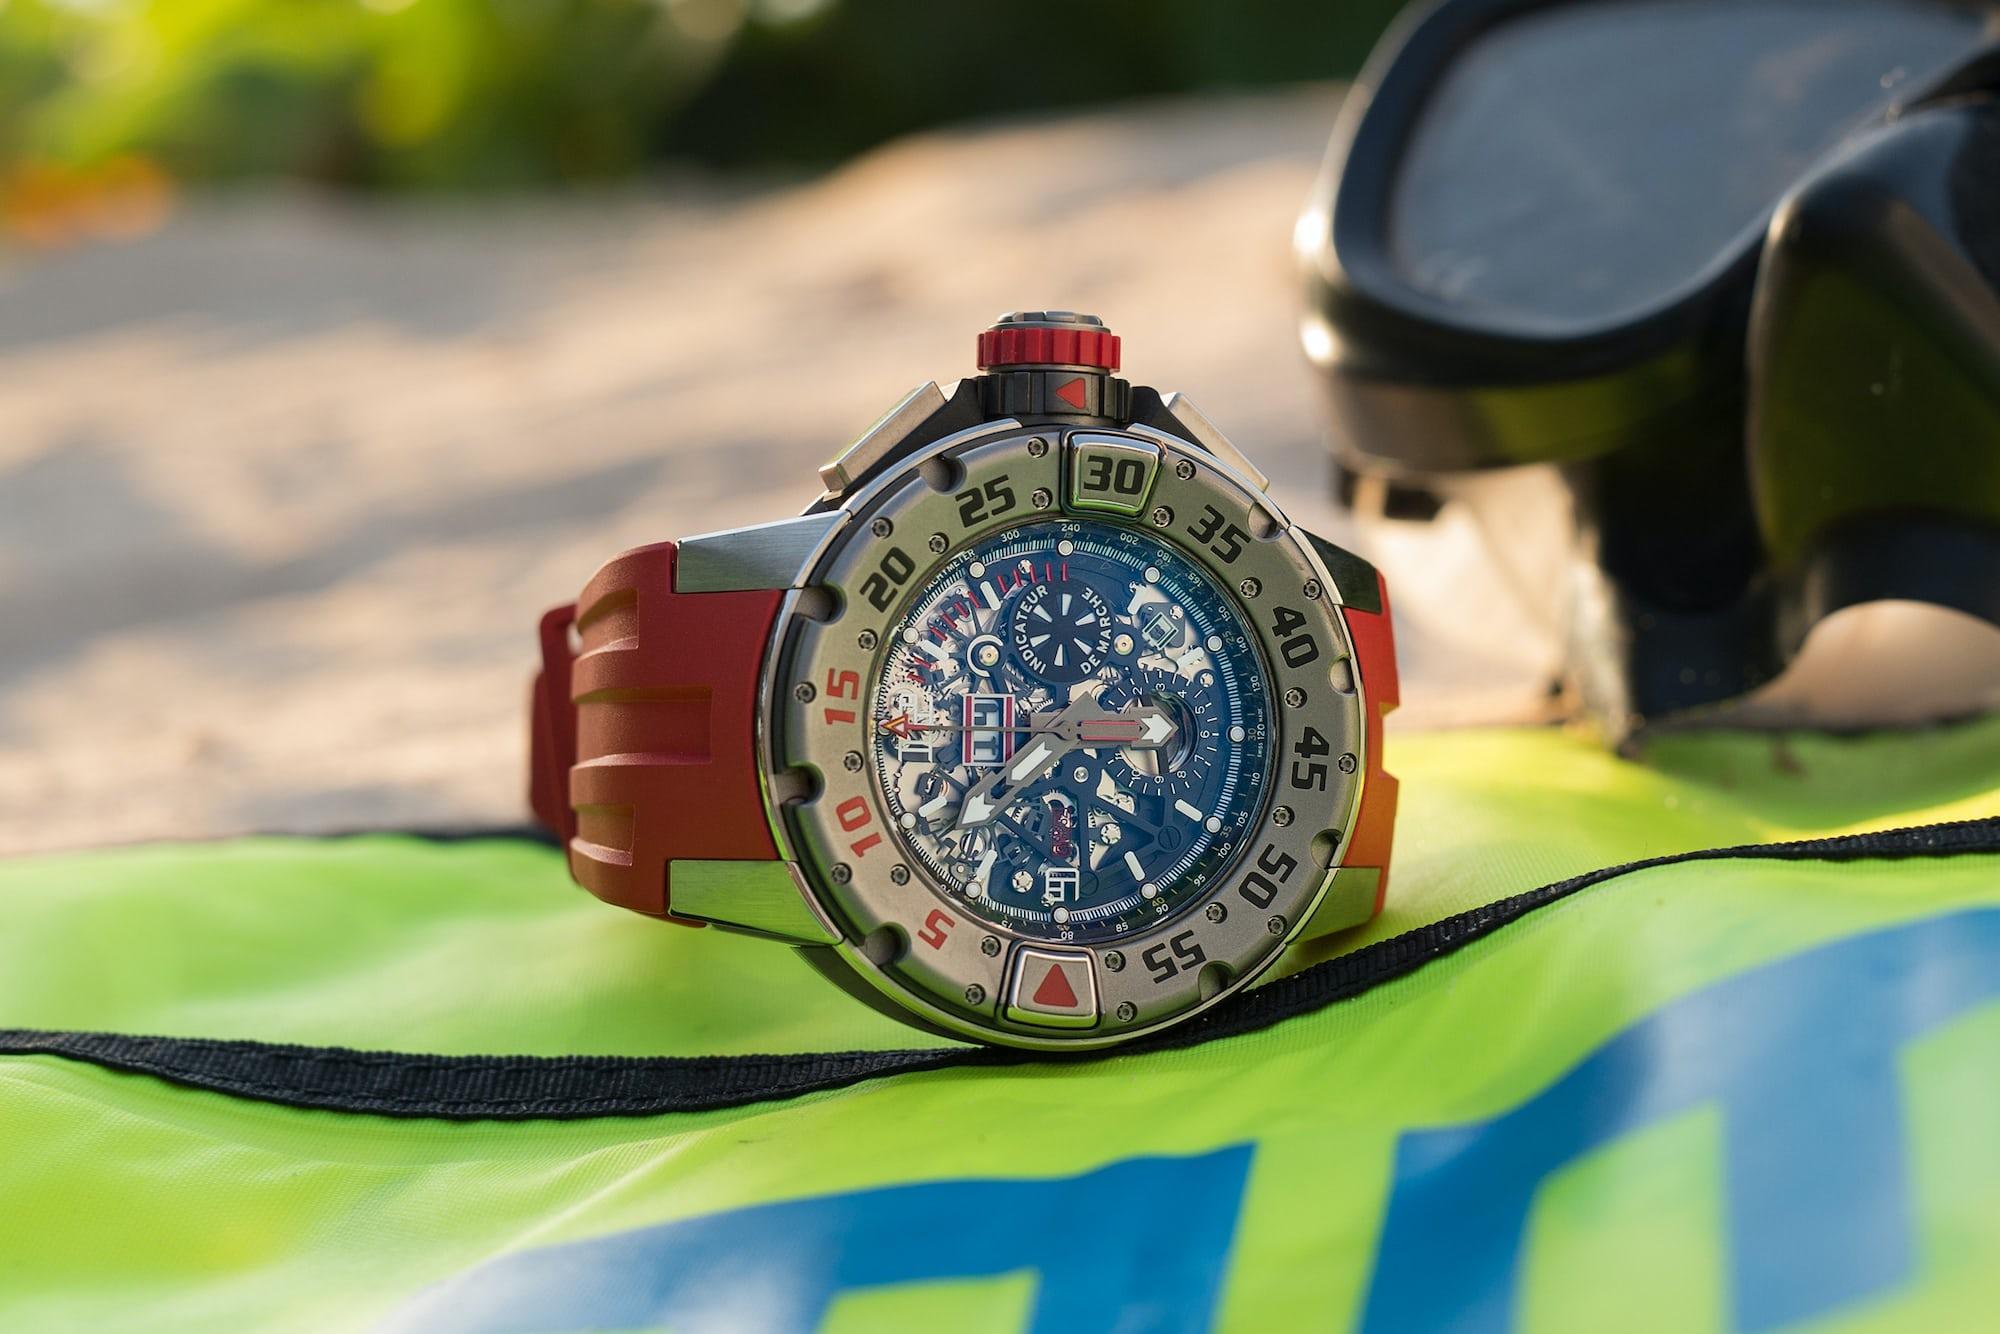 richard mille RM 032 diving dial skeletonized Hands-On: The Richard Mille RM 032 Diver Flyback Chronograph Hands-On: The Richard Mille RM 032 Diver Flyback Chronograph RM032 6